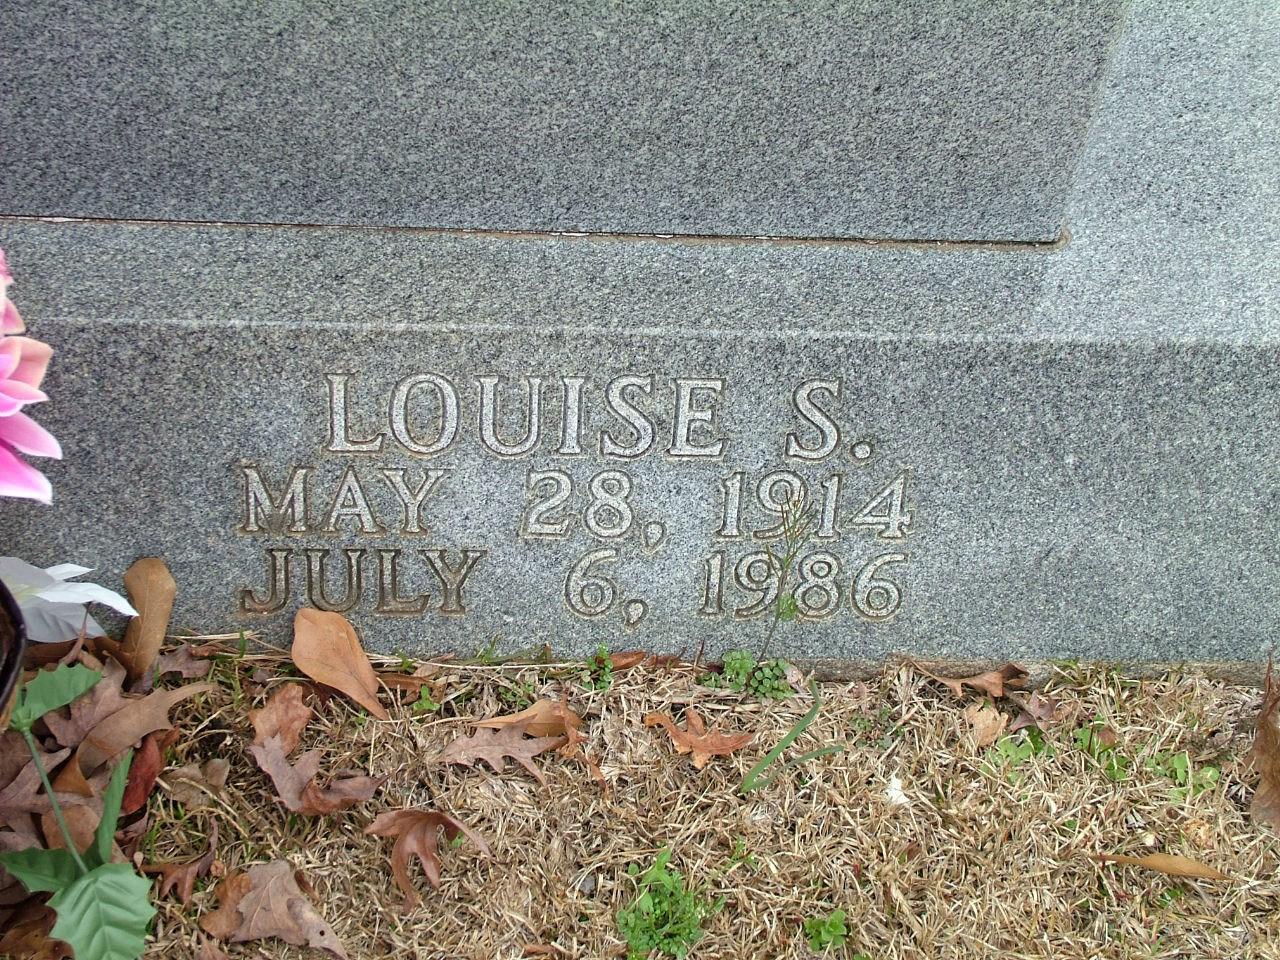 Louise Elizabeth Seymour